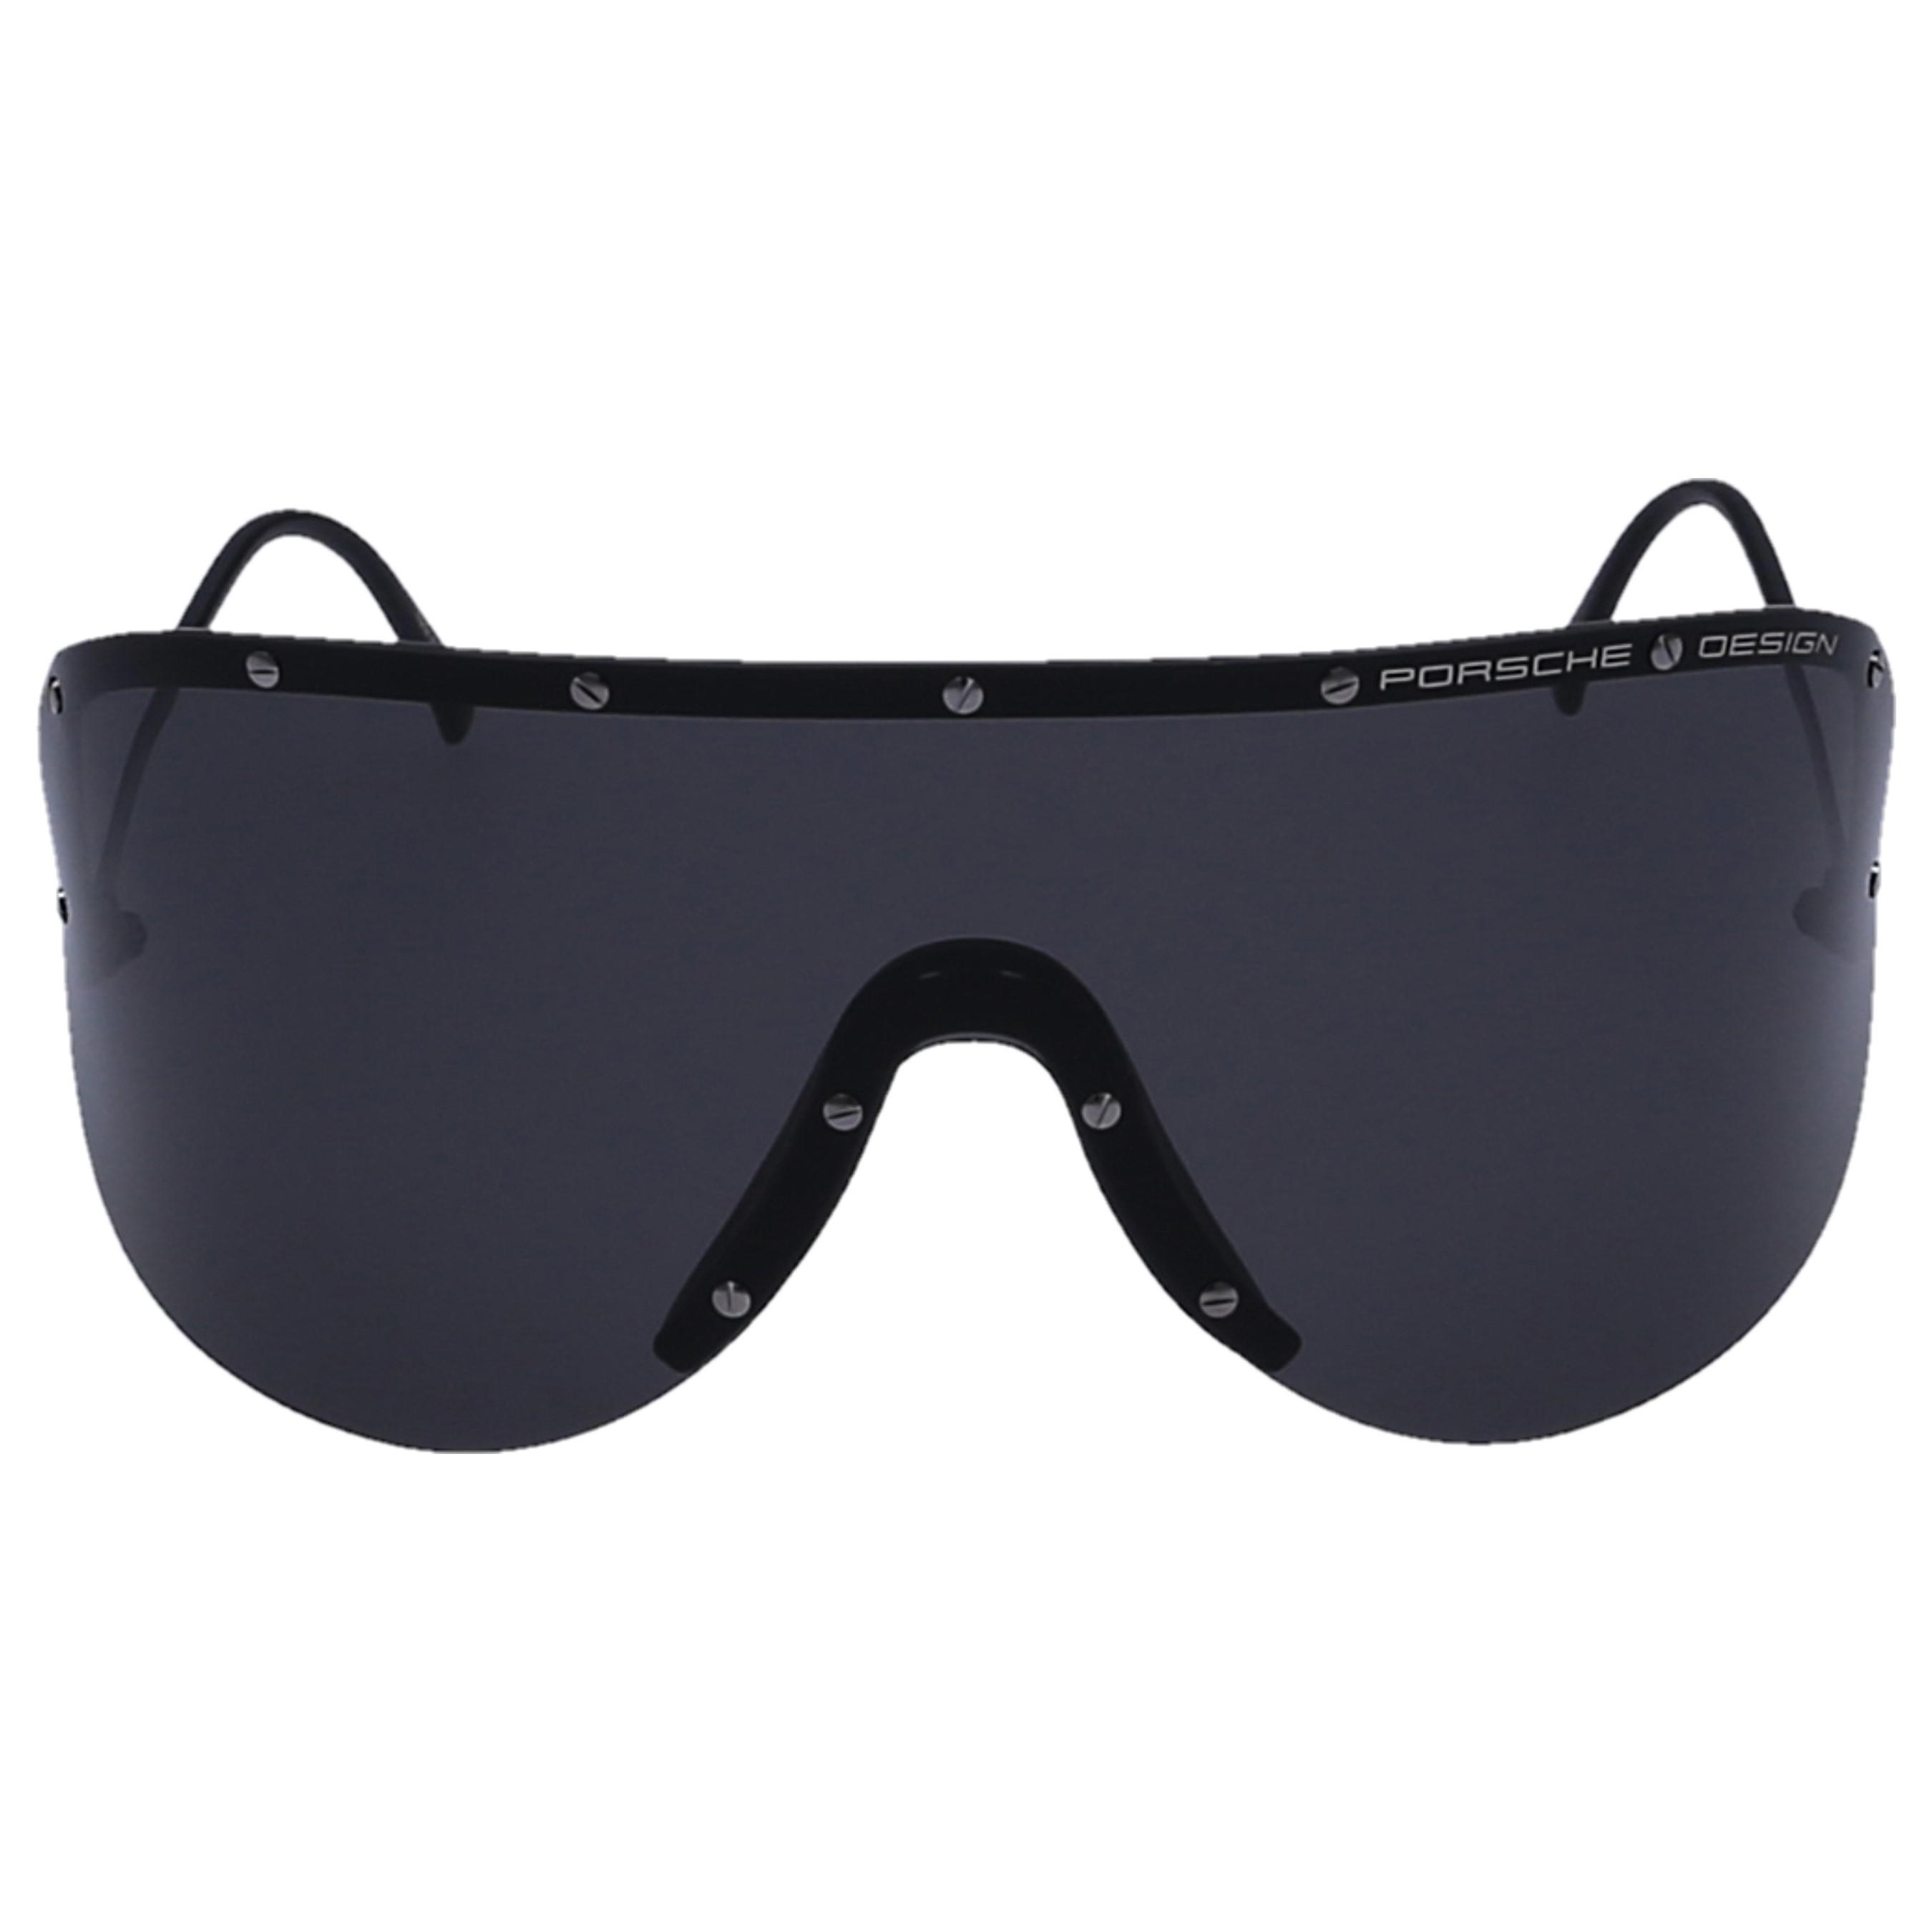 988e76b237a Lyst - Porsche Design Men Sunglasses Shield 8479 Metal Black in ...